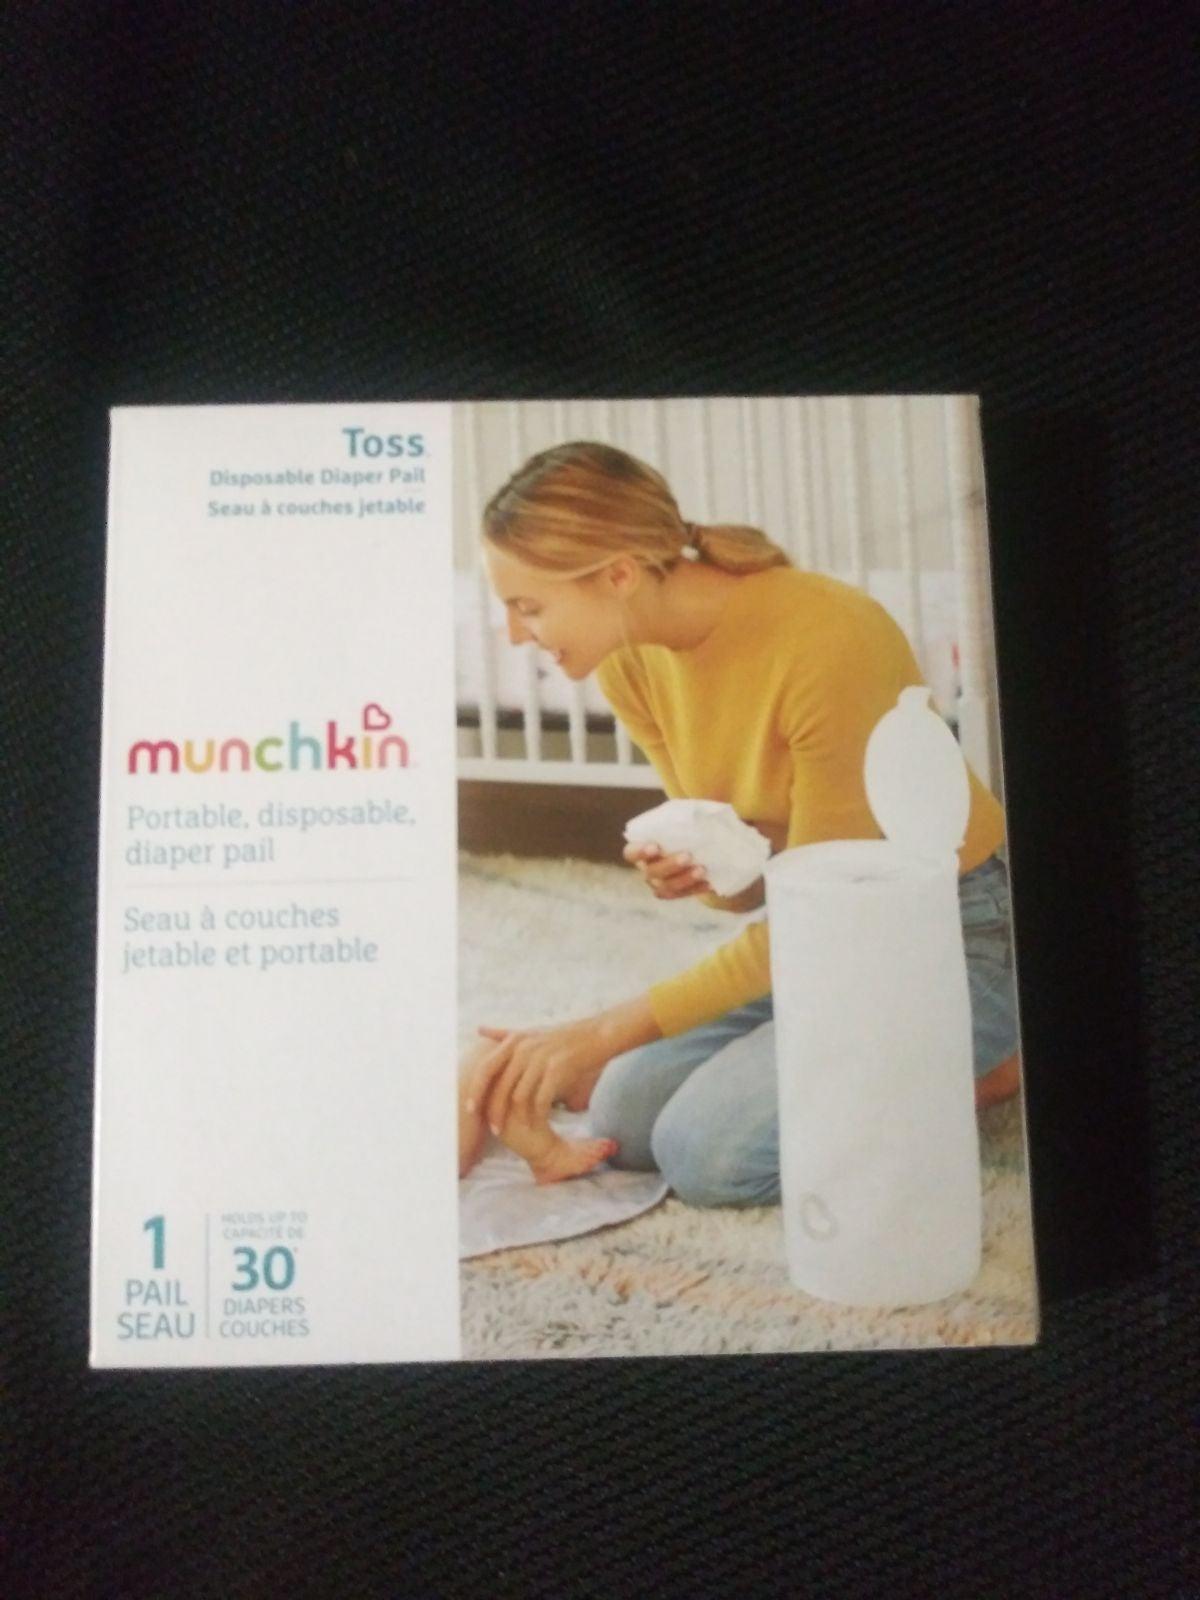 Munchkin Disposable diaper pail!